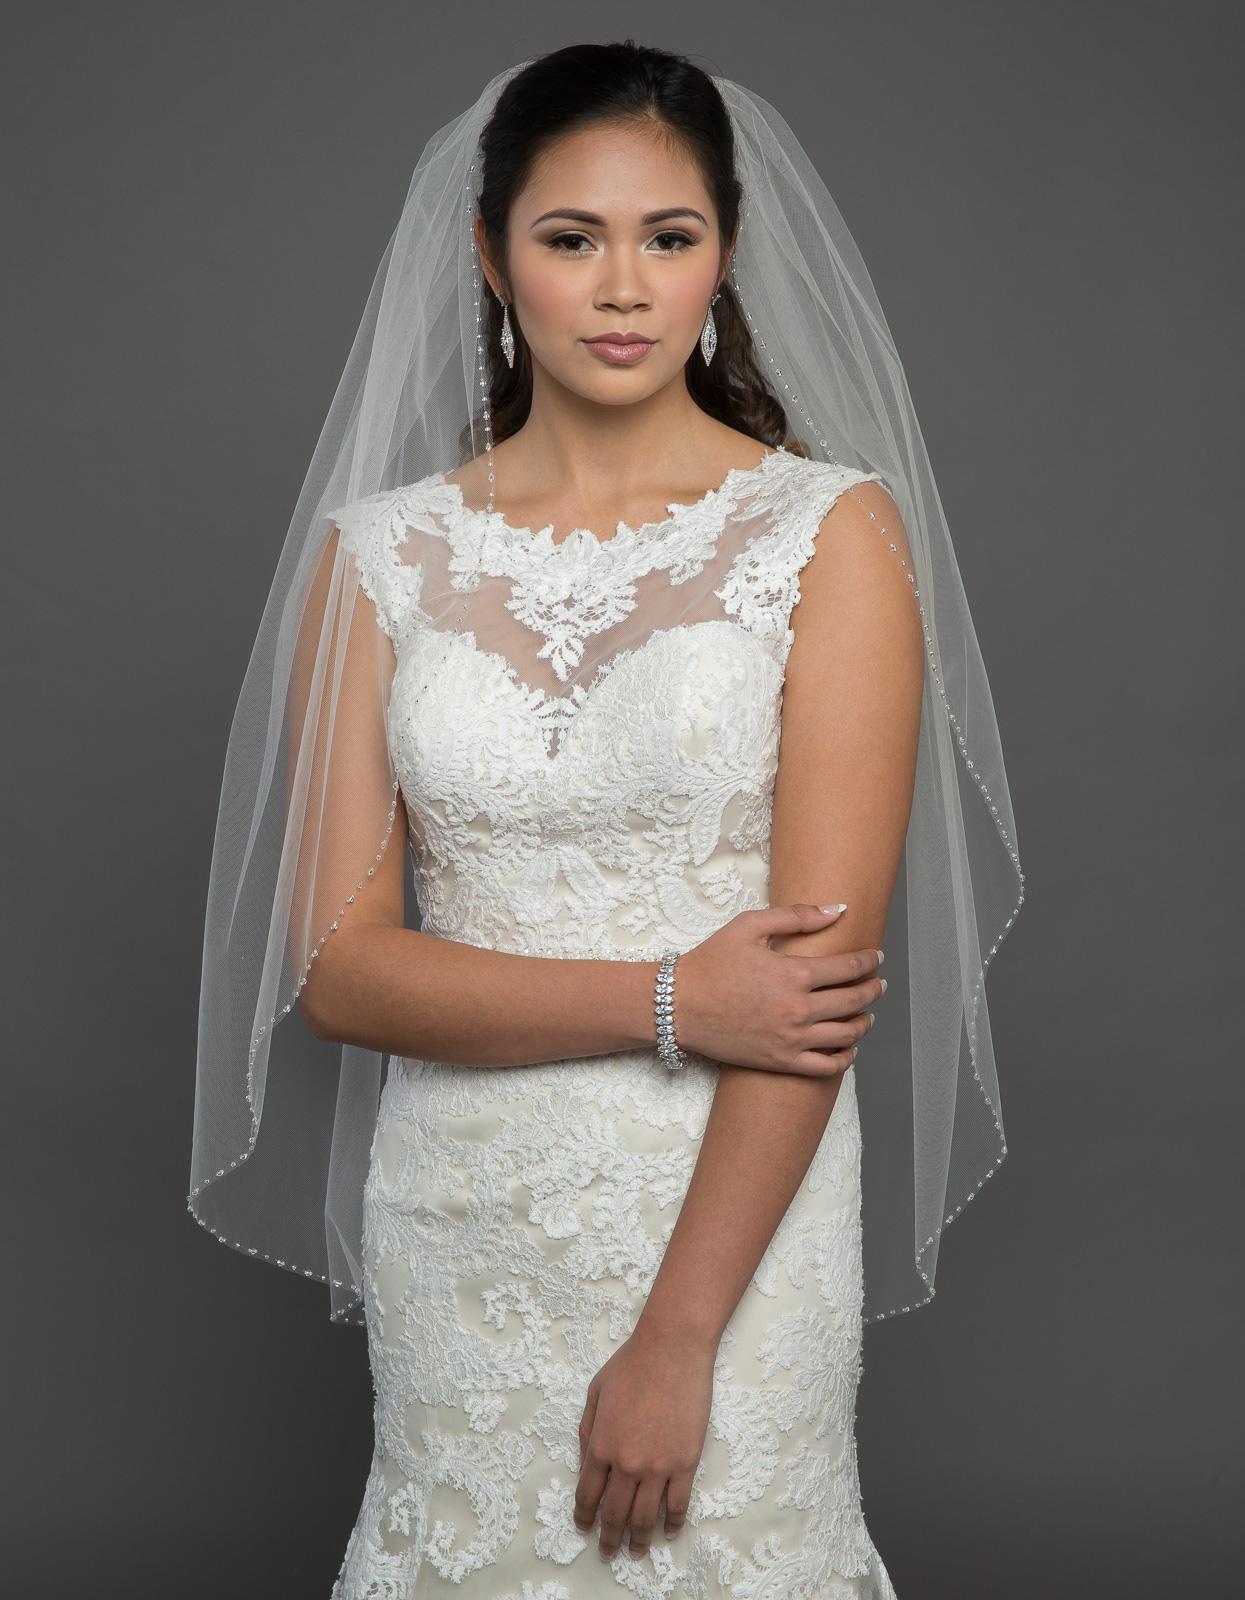 Bridal Classics Marquise Veil Collection MV-2407